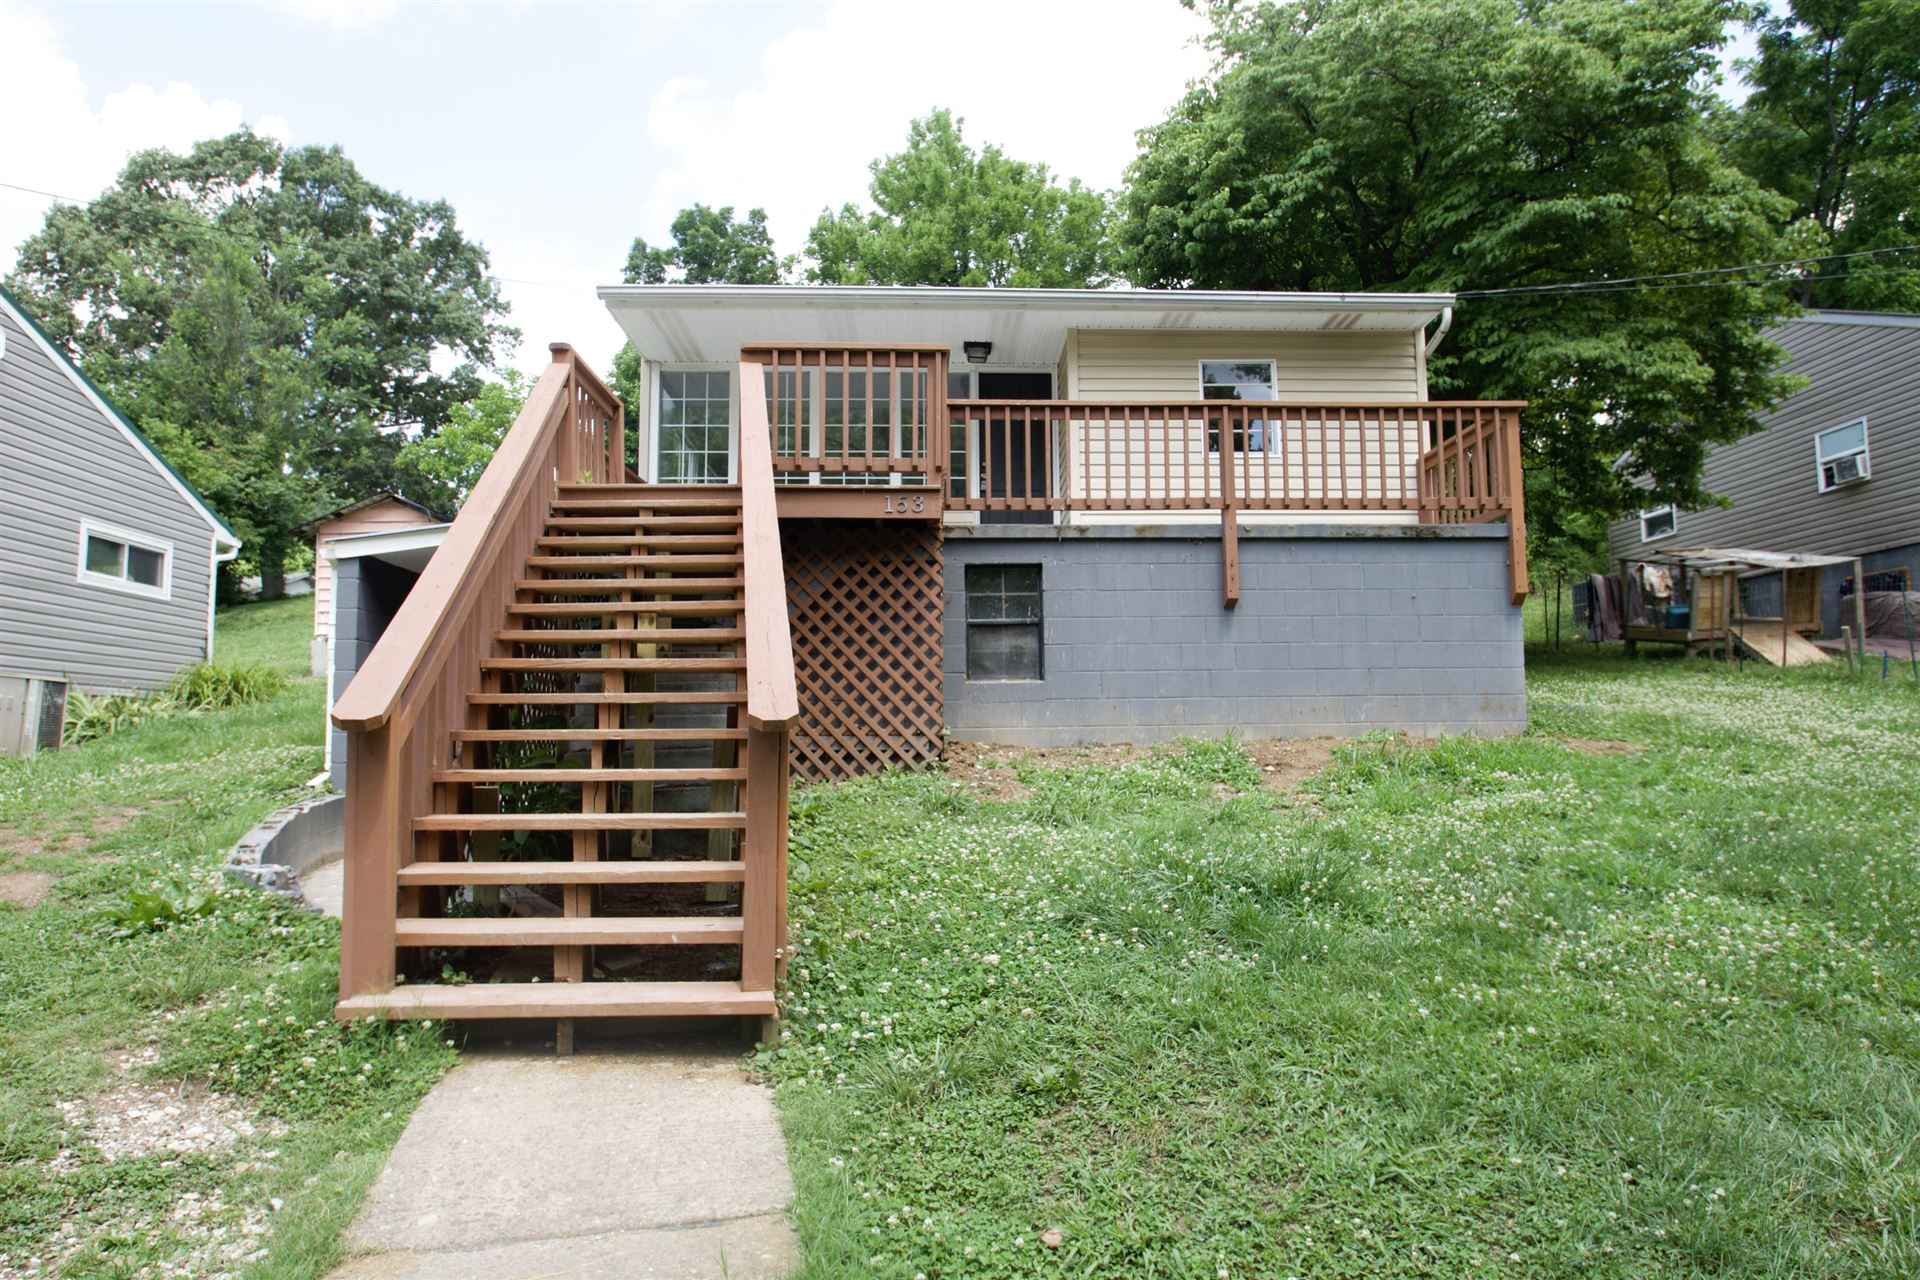 Photo of 153 Johnson Rd, Oak Ridge, TN 37830 (MLS # 1155871)